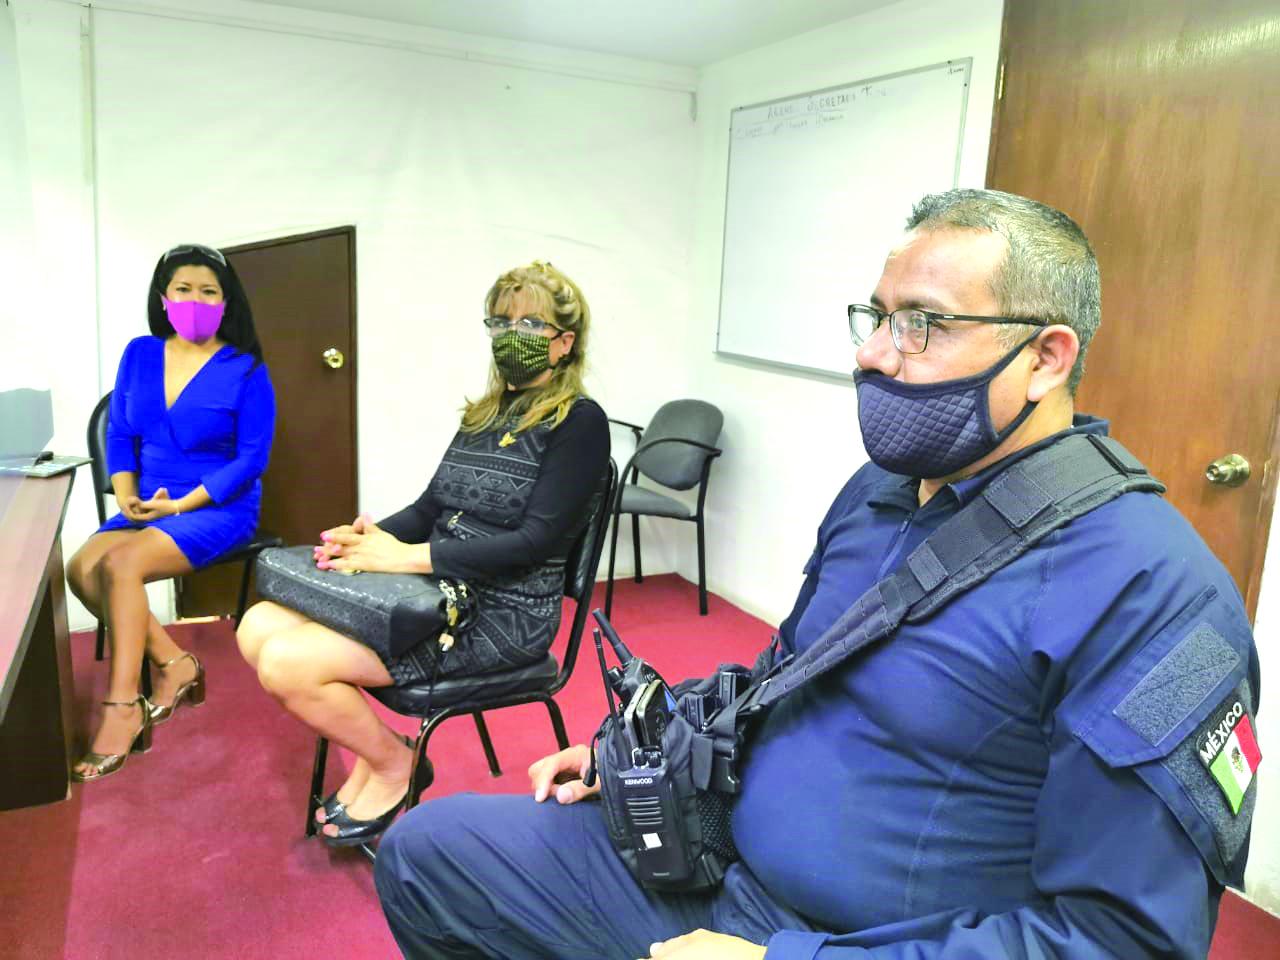 Policías recibirán capacitación sobre violencia familiar